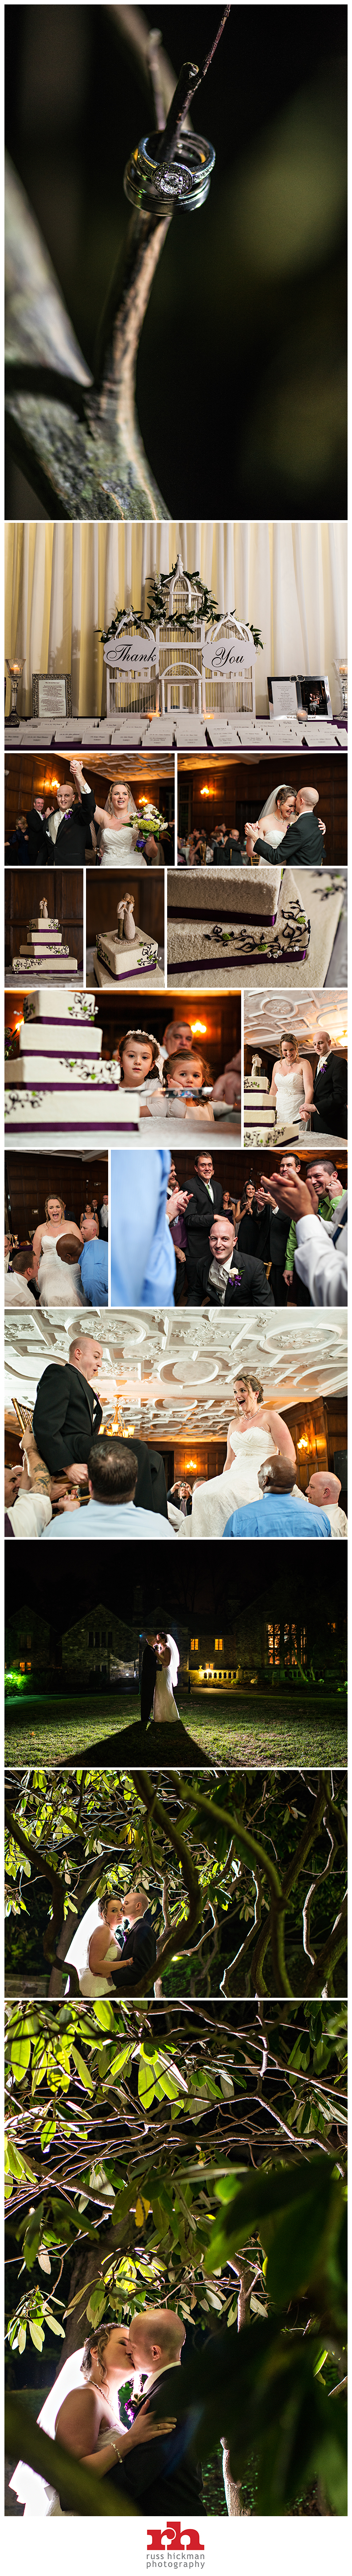 Philadelphia Wedding Photographer ABWB0007